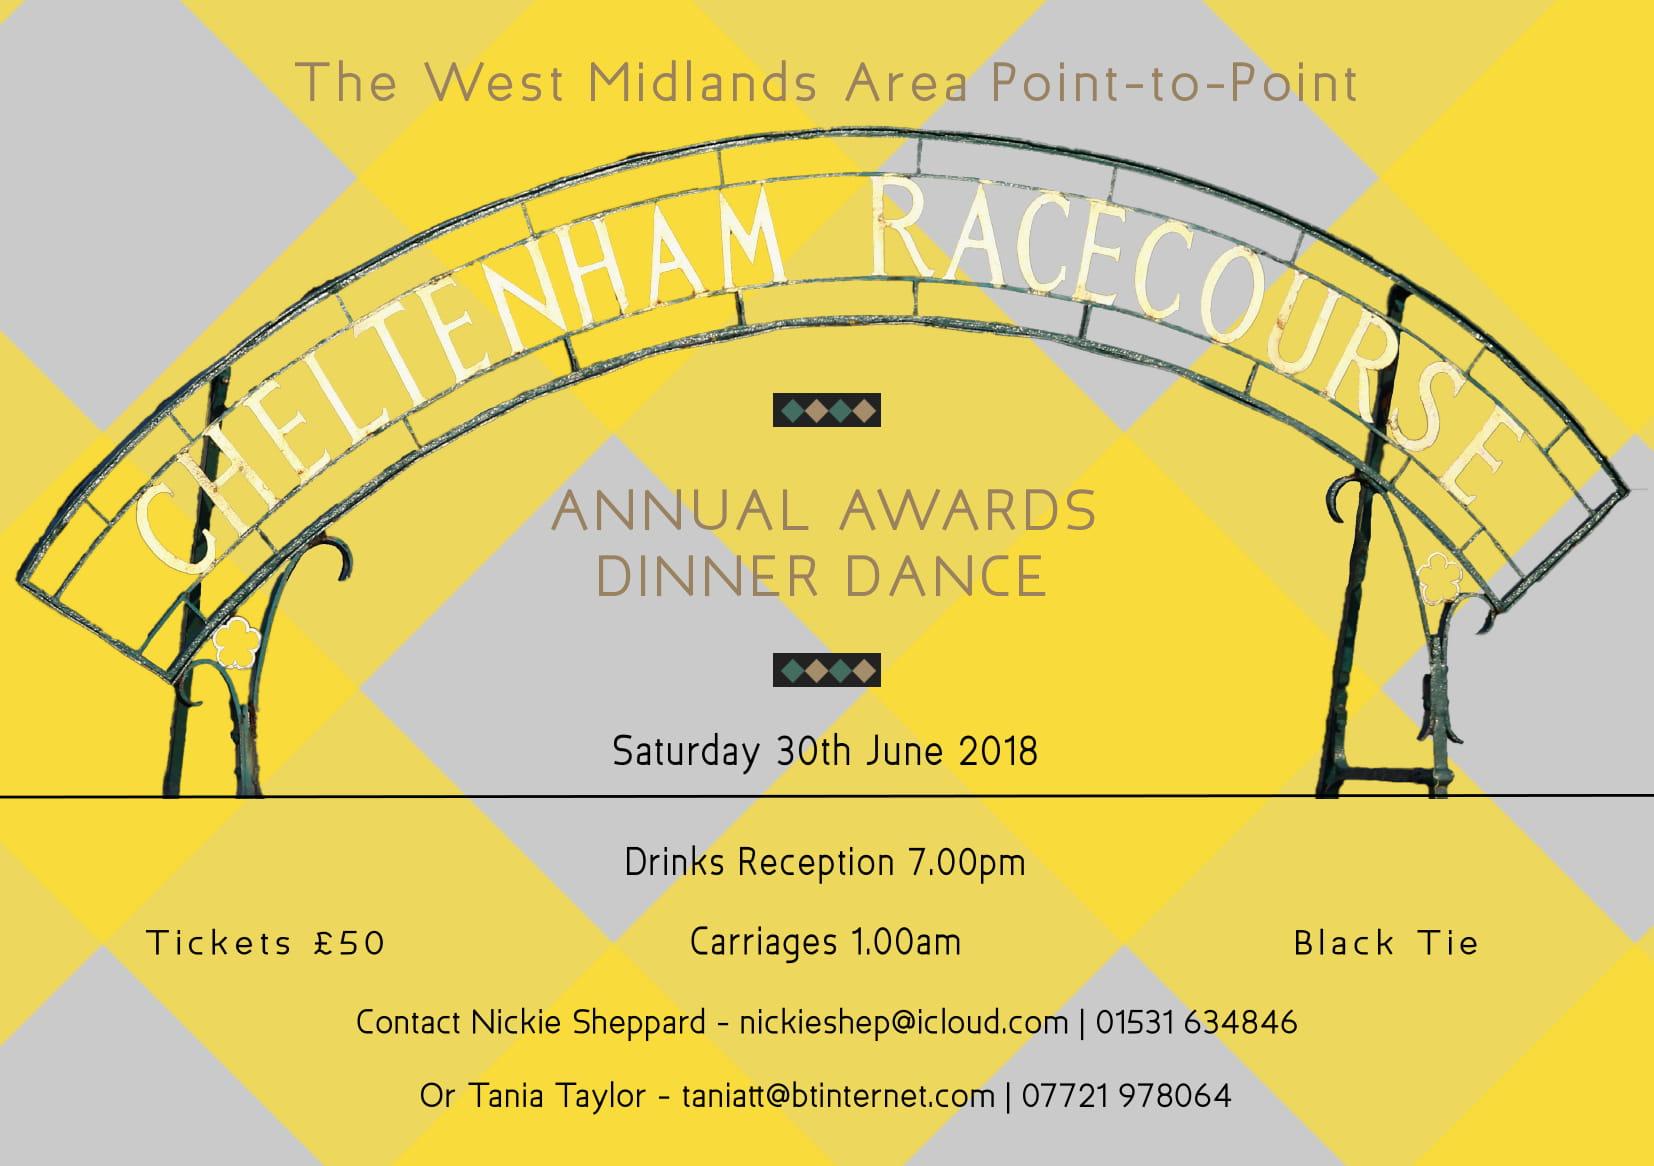 The West Midlands Area Annual Awards & Dinner Dance 2018